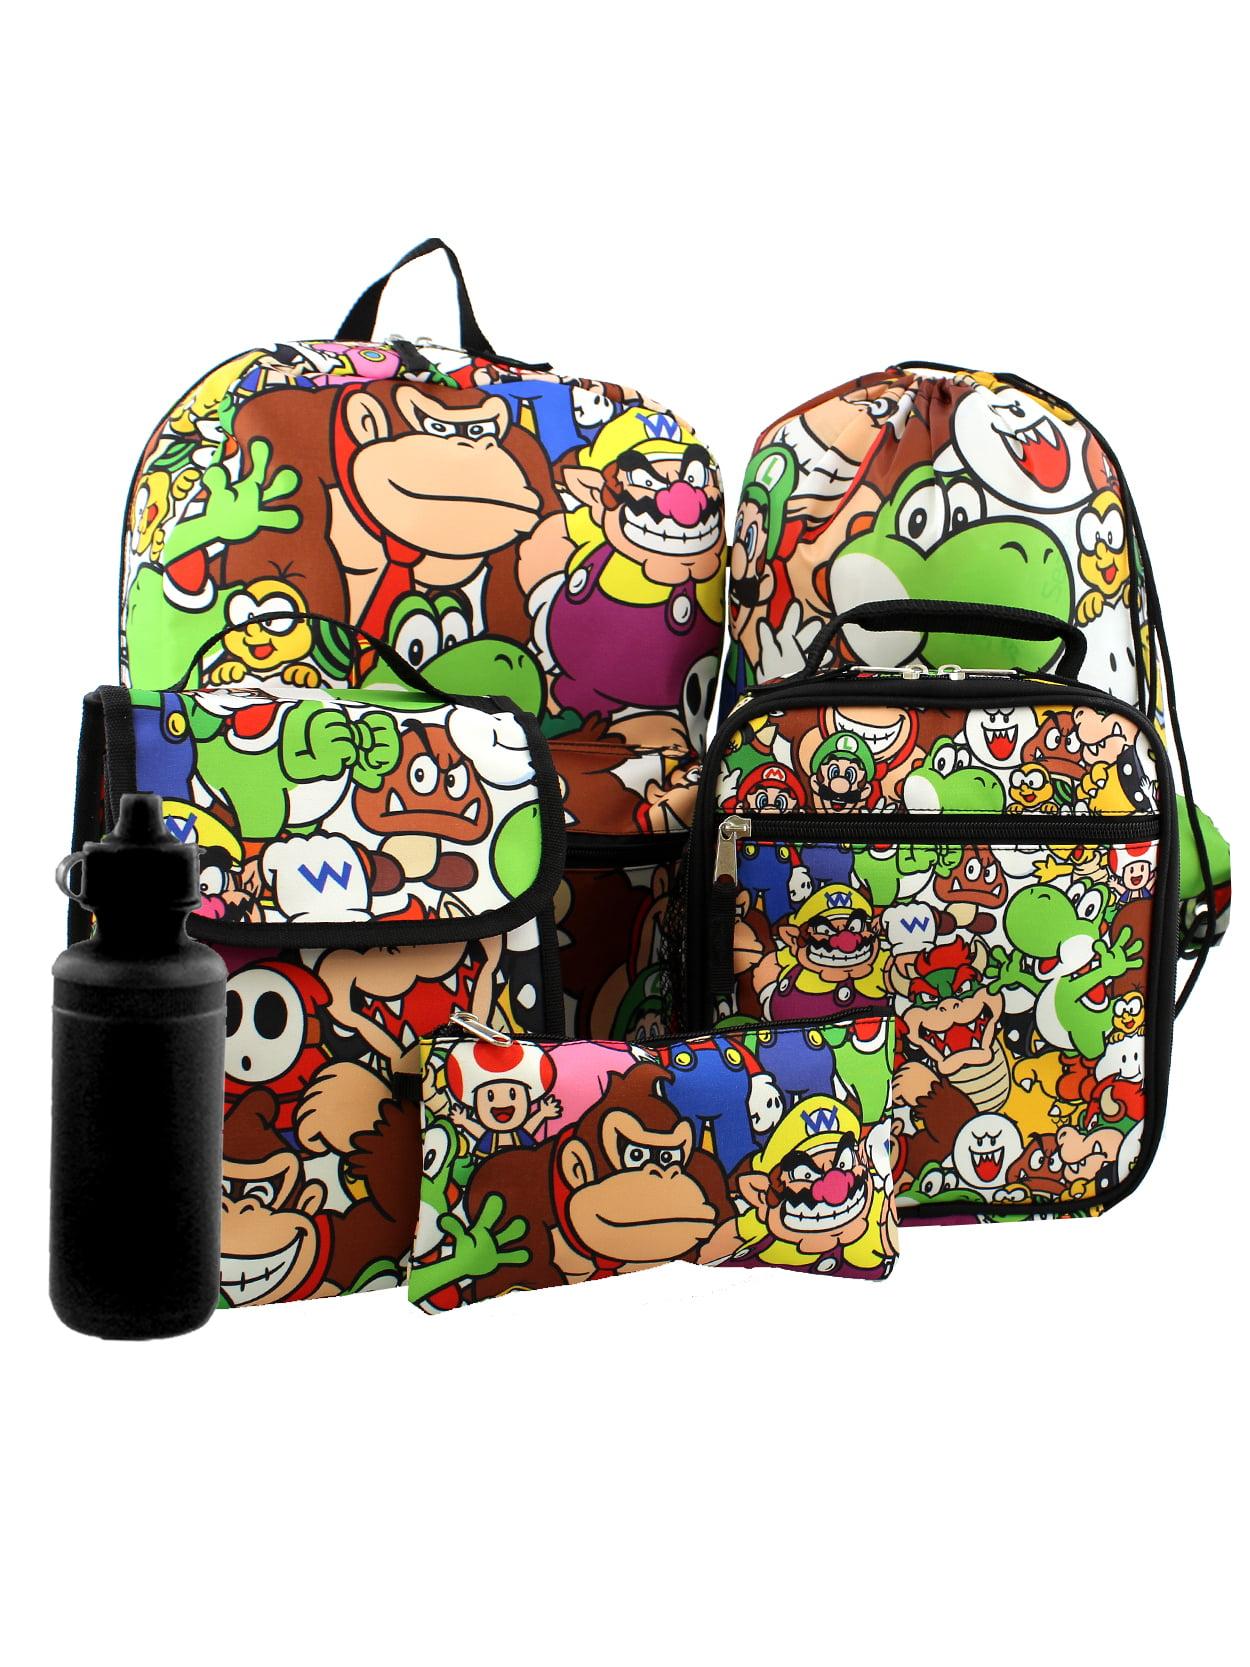 Kids Child Super Mario Bros Insulated Lunch Bag School Snack Box Travel HandBag